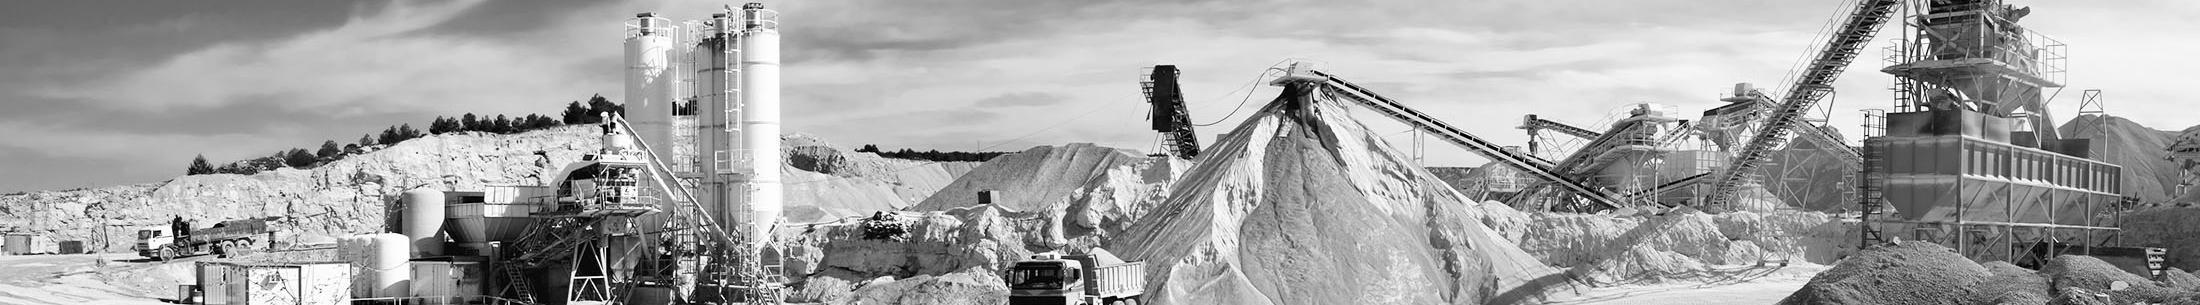 Mining & Materials - Rotolok India